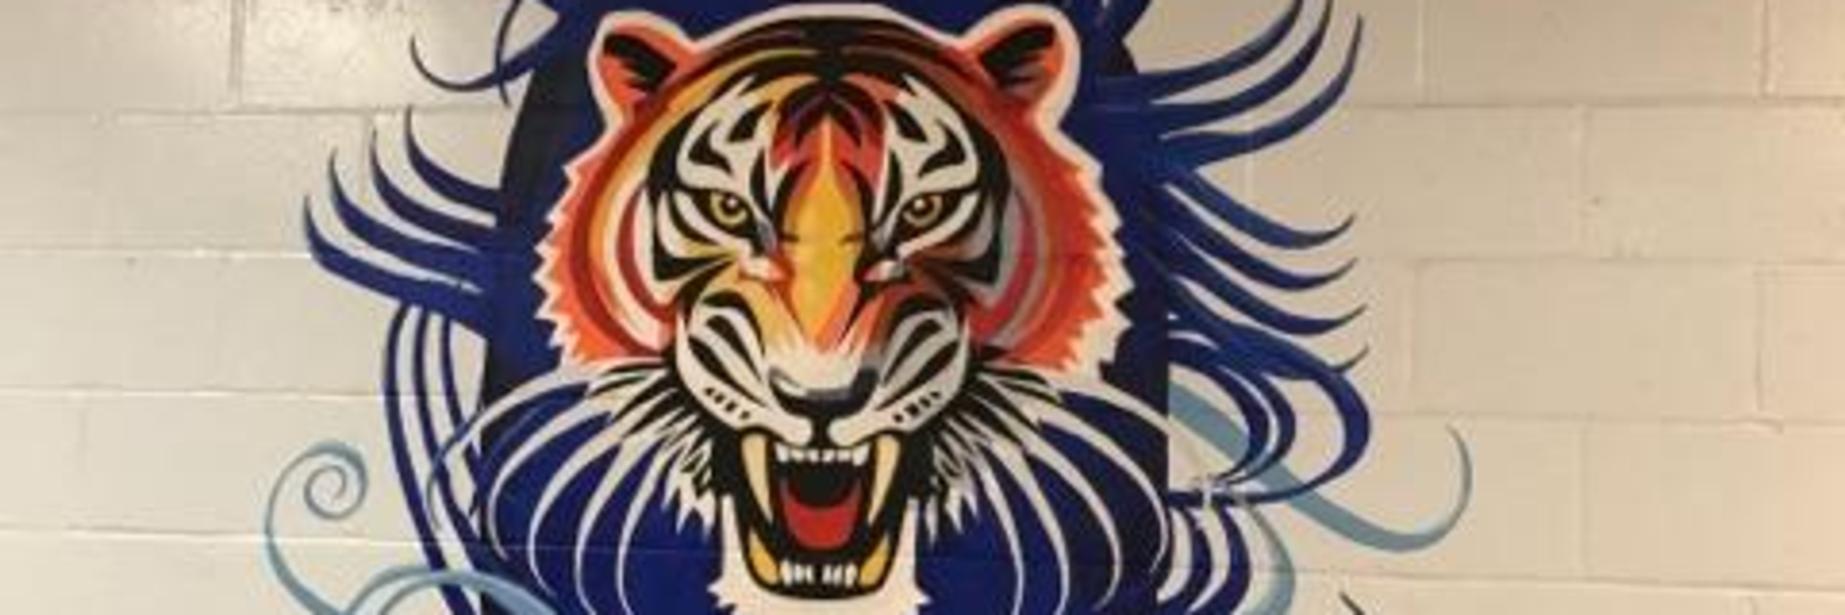 malone mascot mural